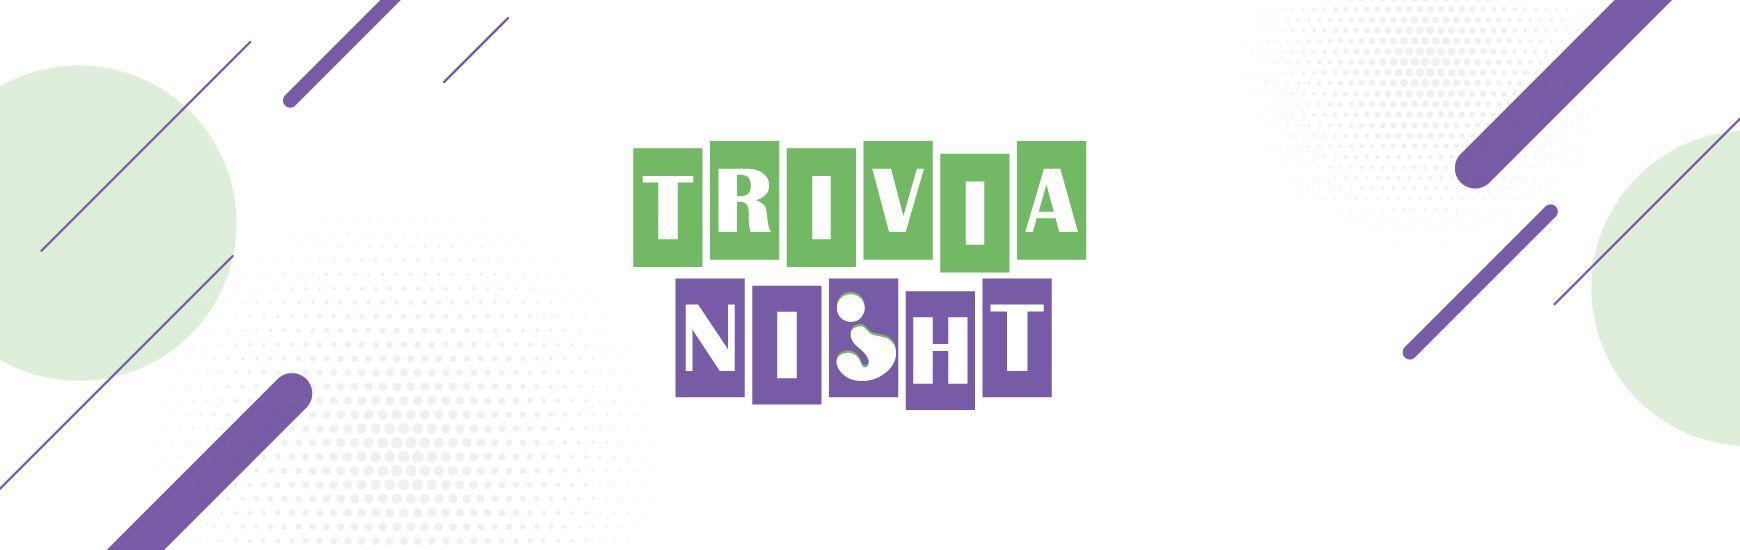 Virtual Trivia February 24